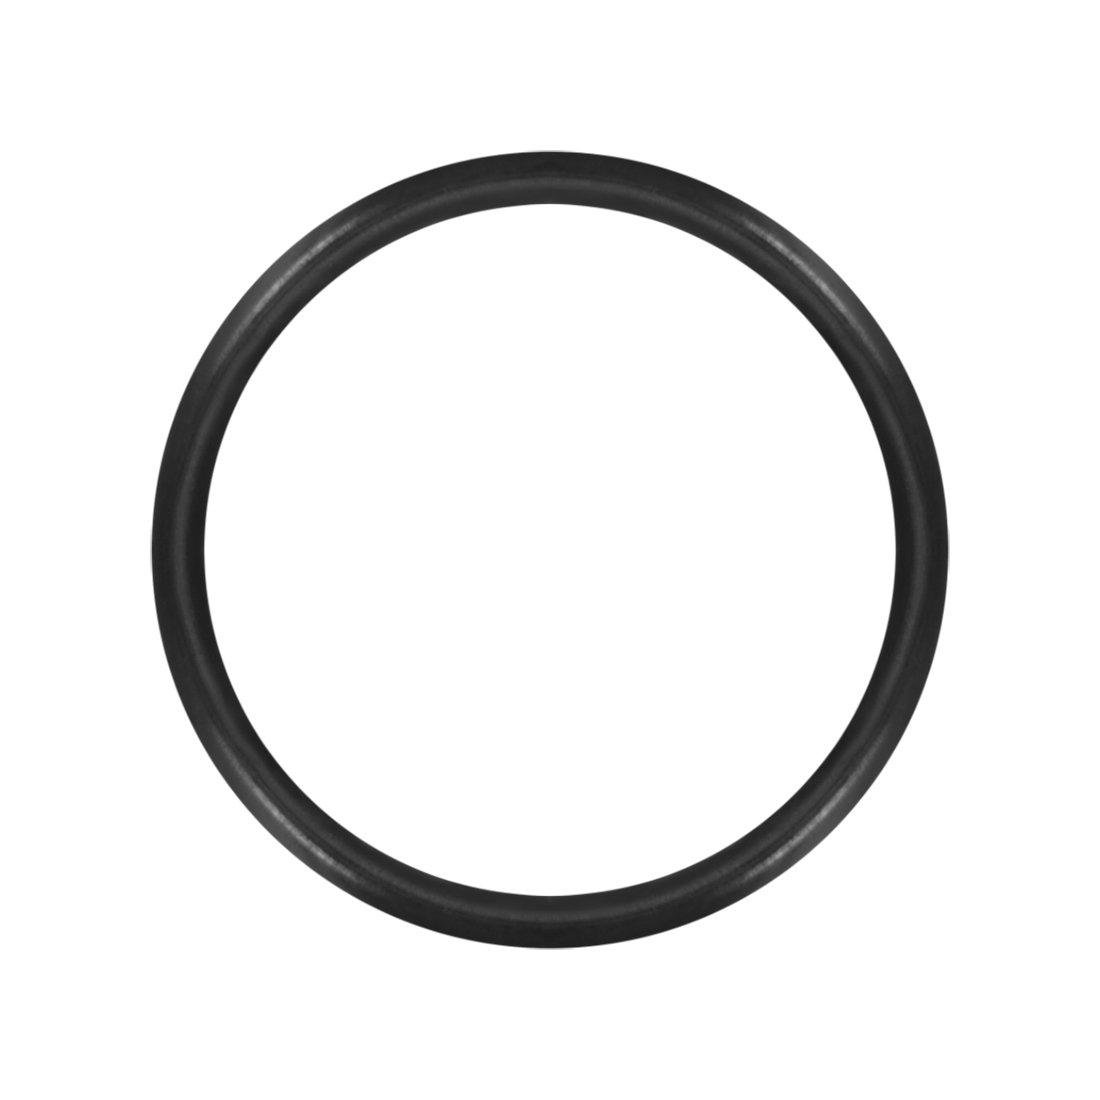 14mm OD sourcingmap O-Rings Nitrile Rubber Pack of 50 1mm Width Round Seal Gasket 12mm Inner Diameter